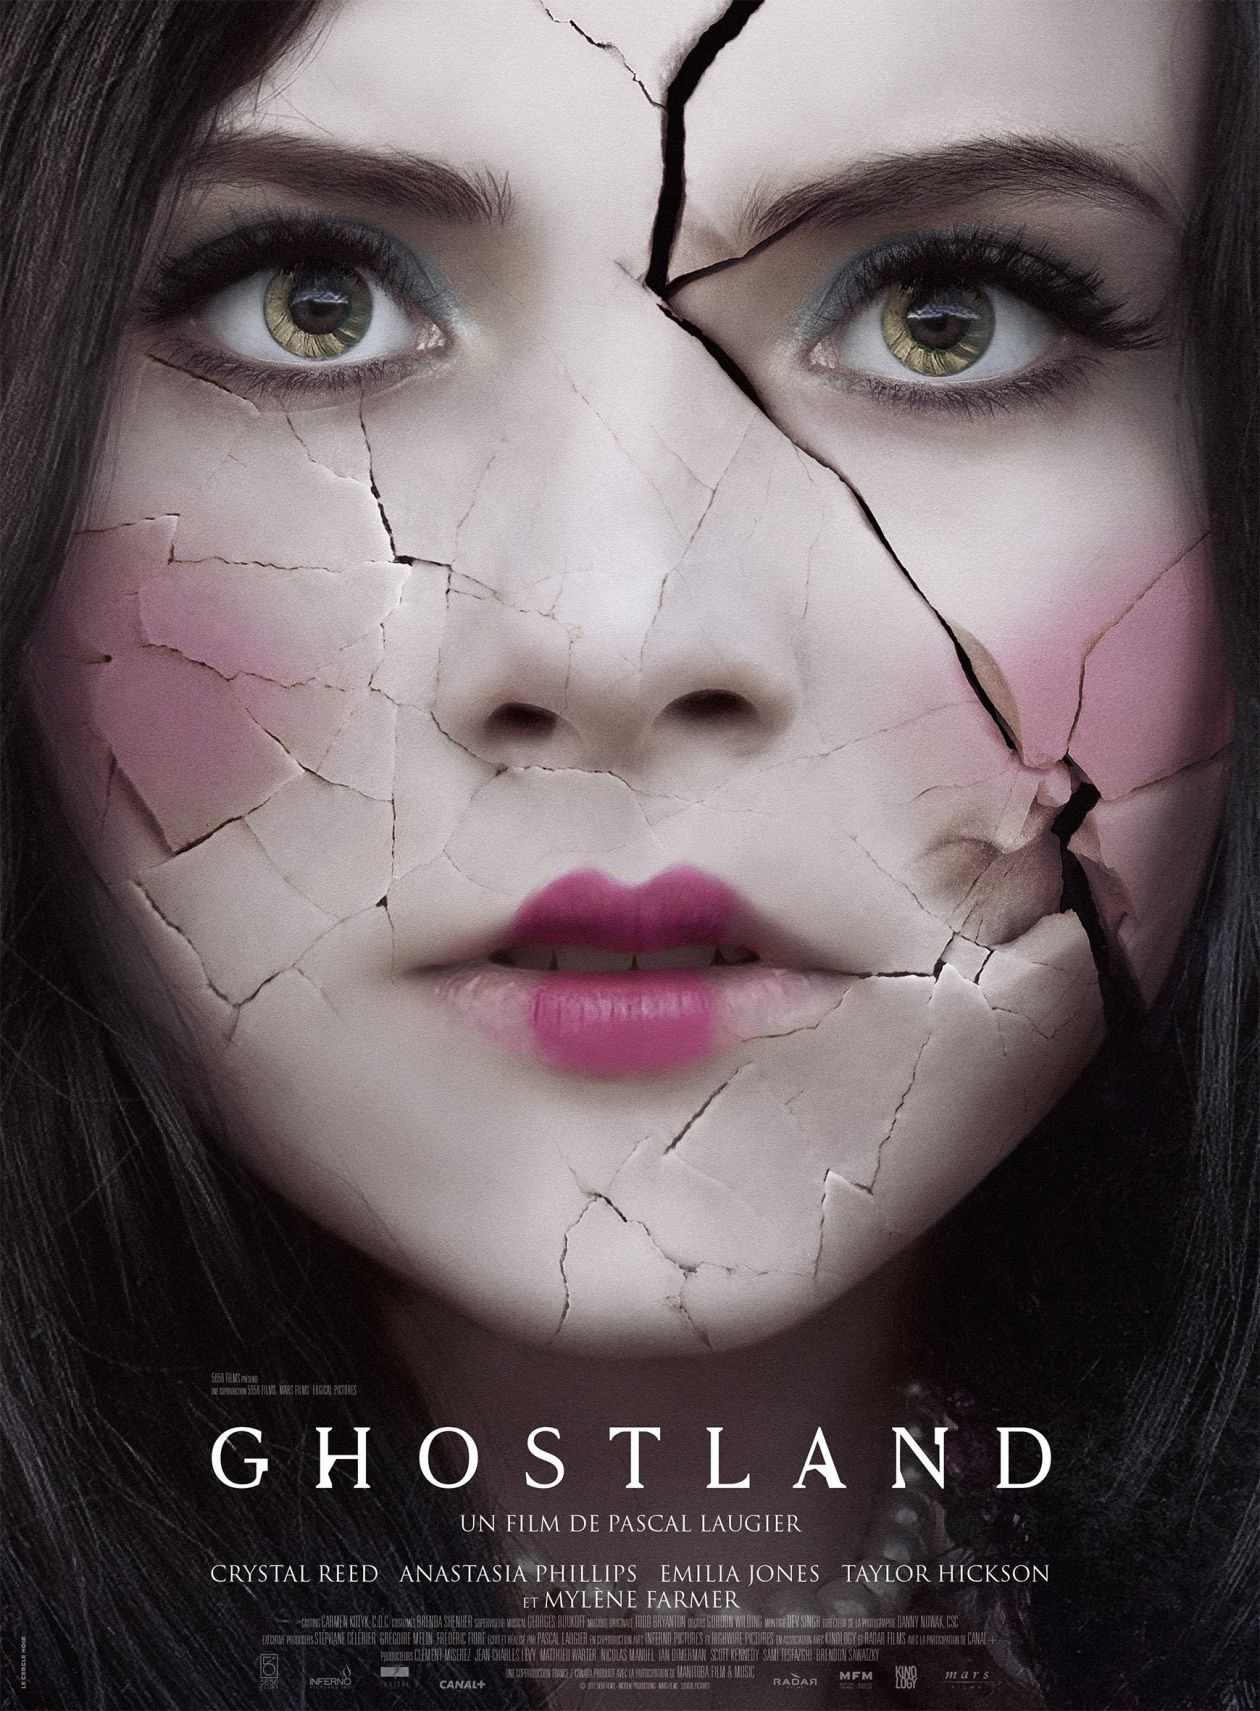 Crystal Reed actress / Elizabeth Keller / Ghostland / Pascal Laugier 2018 Movie Poster Affiche film